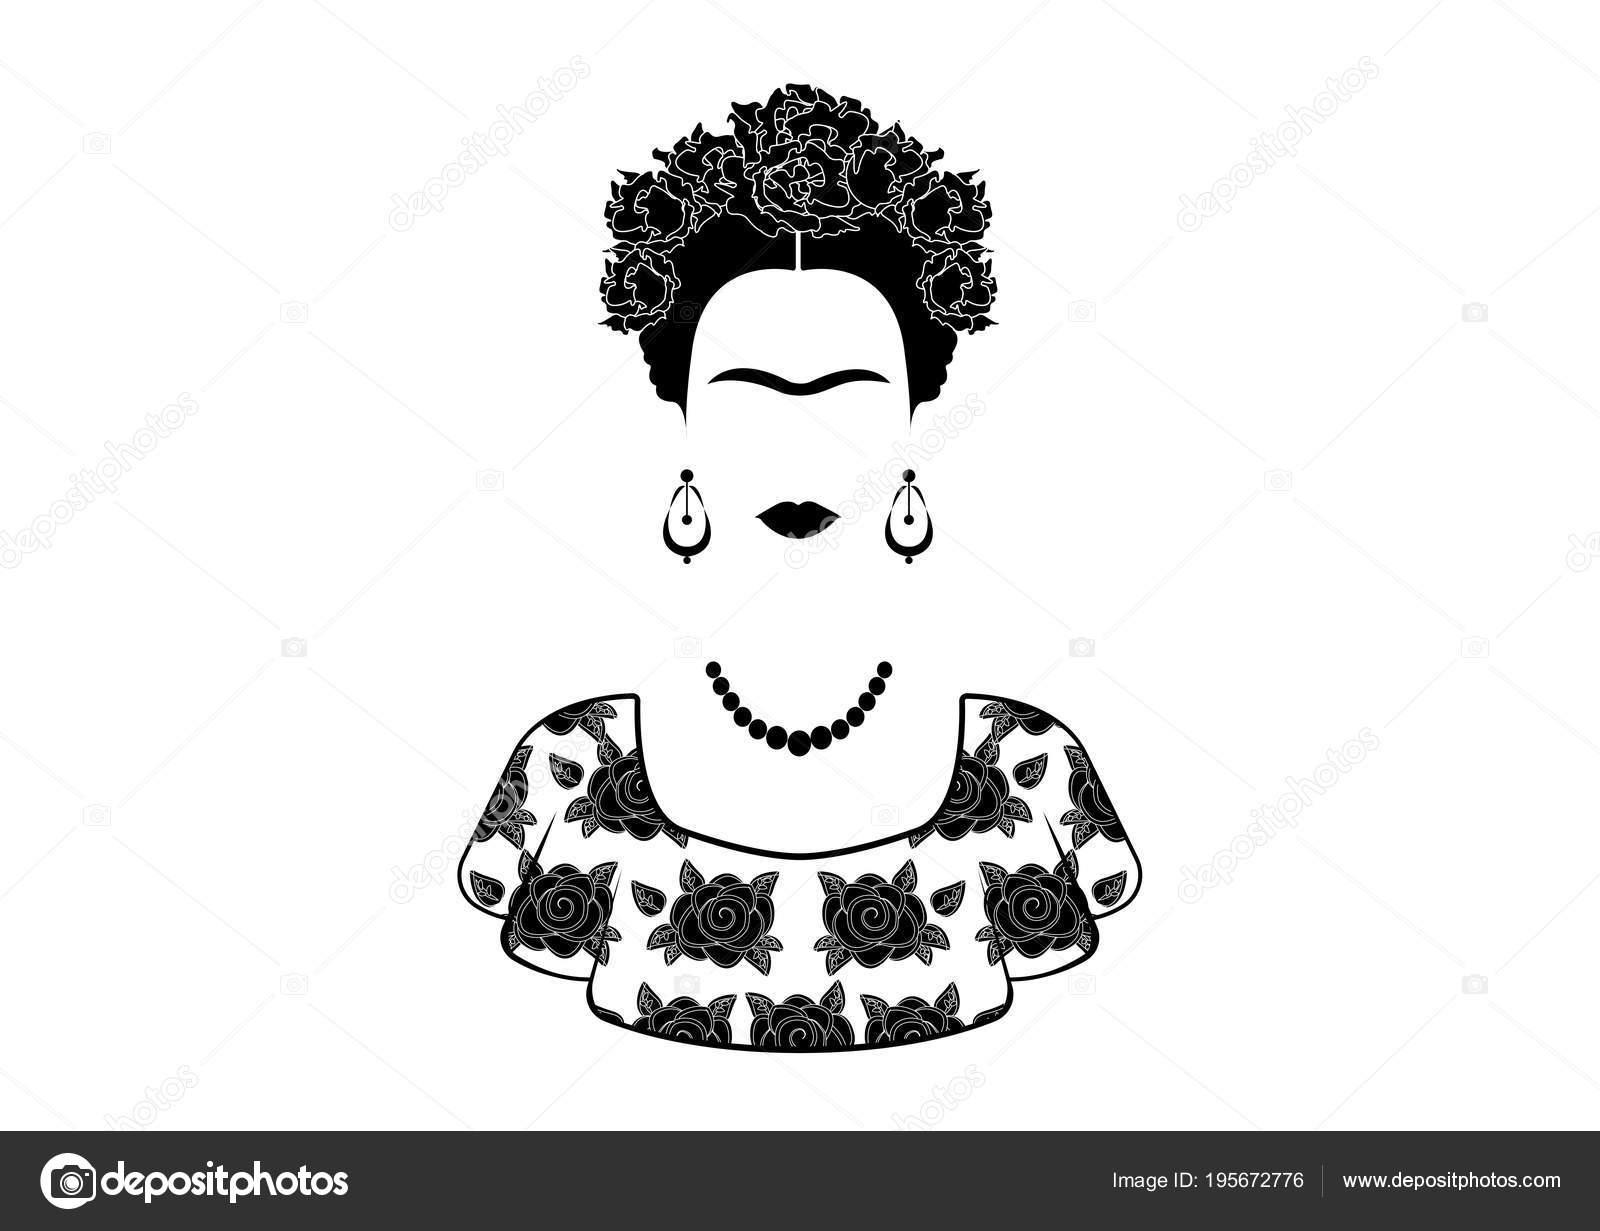 Imagenes De Frida Kahlom Para Colorear: Frida Kahlo INSTANT DOWNLOAD Black And White Minimalist